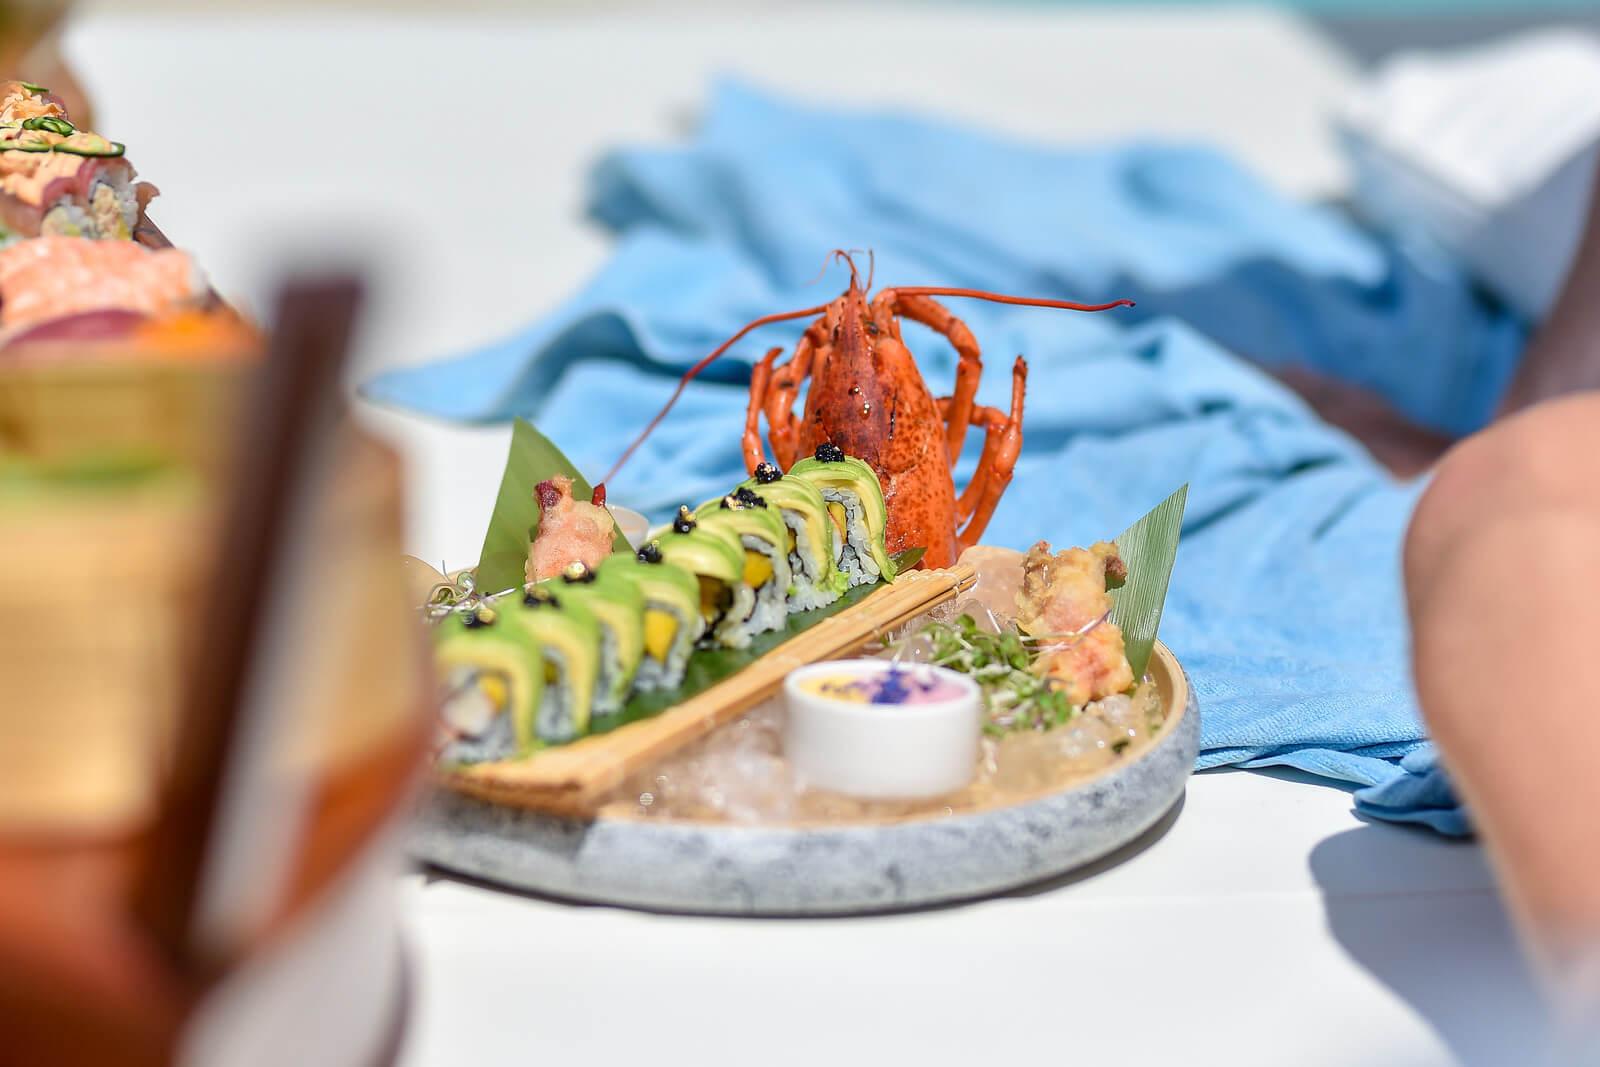 https://www.white-ibiza.com/wp-content/uploads/2020/03/white-ibiza-restaurants-nikki-beach-ibiza-2020-15.jpg